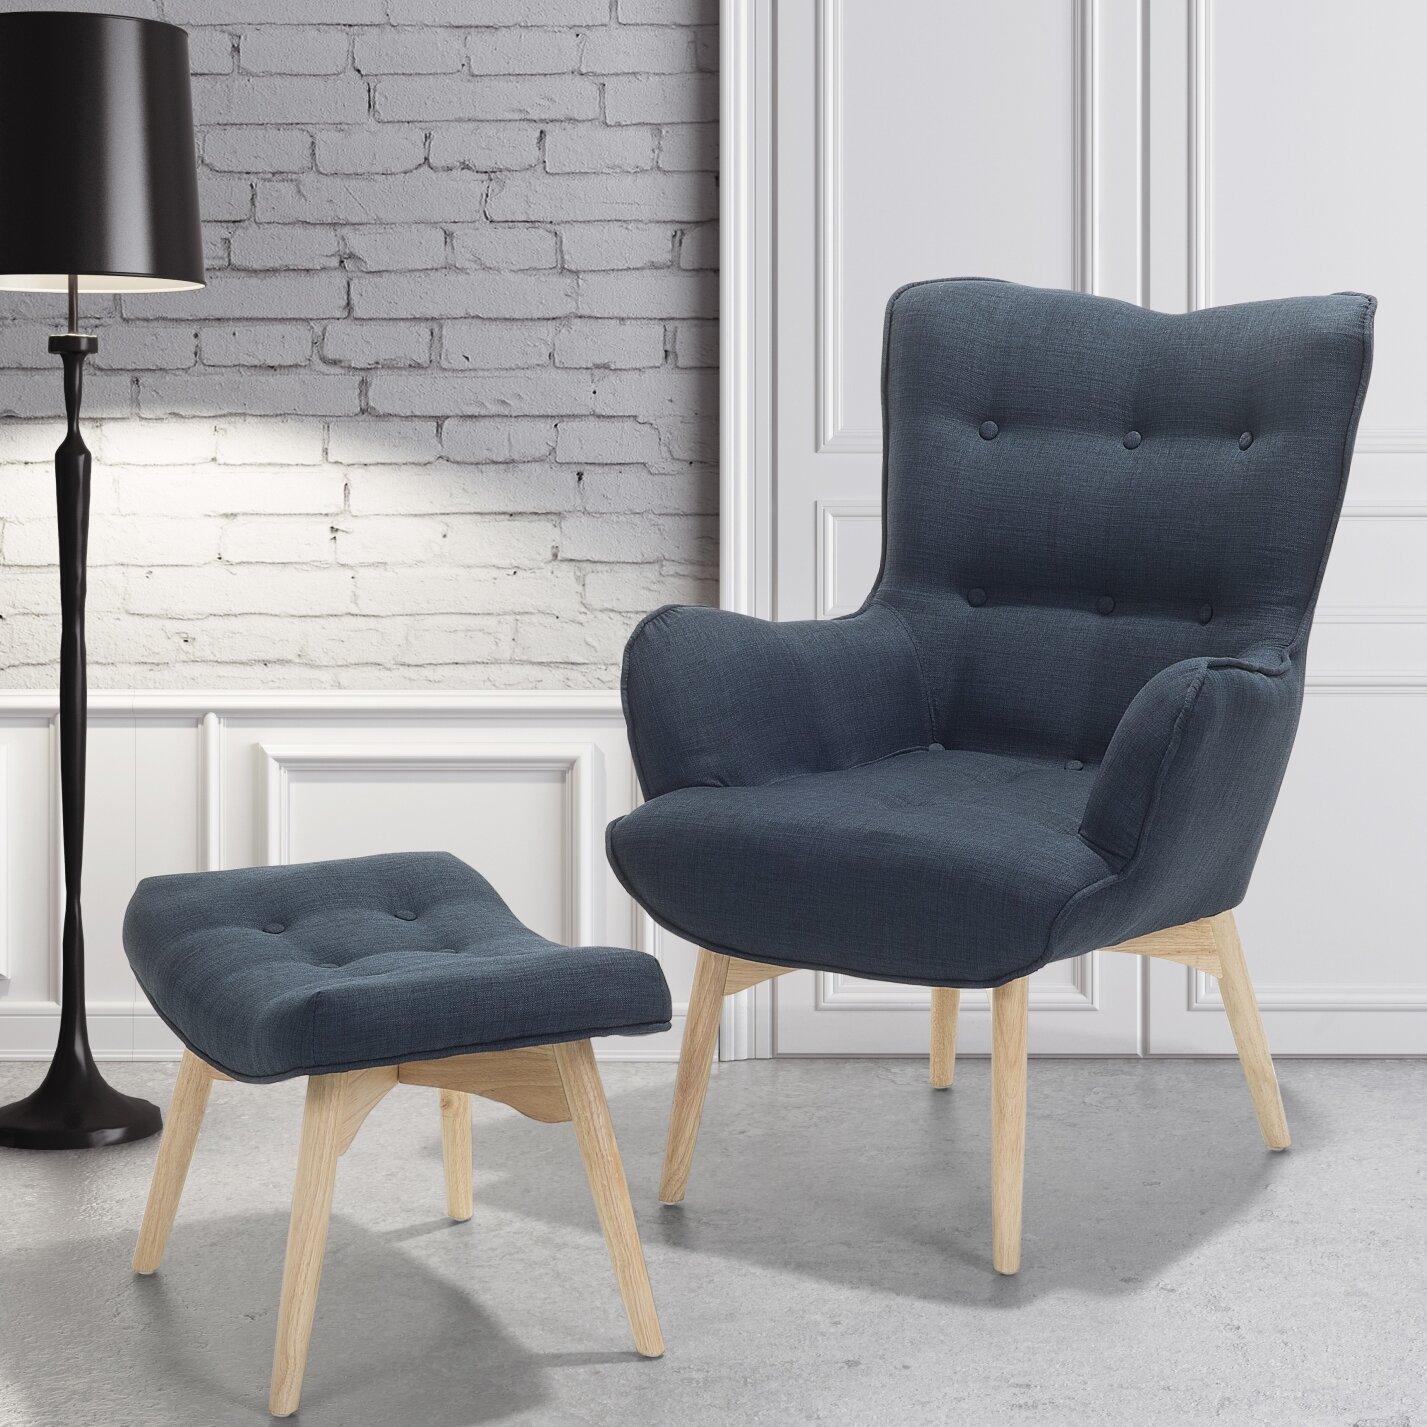 corrigan studio einzelsessel veze mit hocker bewertungen. Black Bedroom Furniture Sets. Home Design Ideas